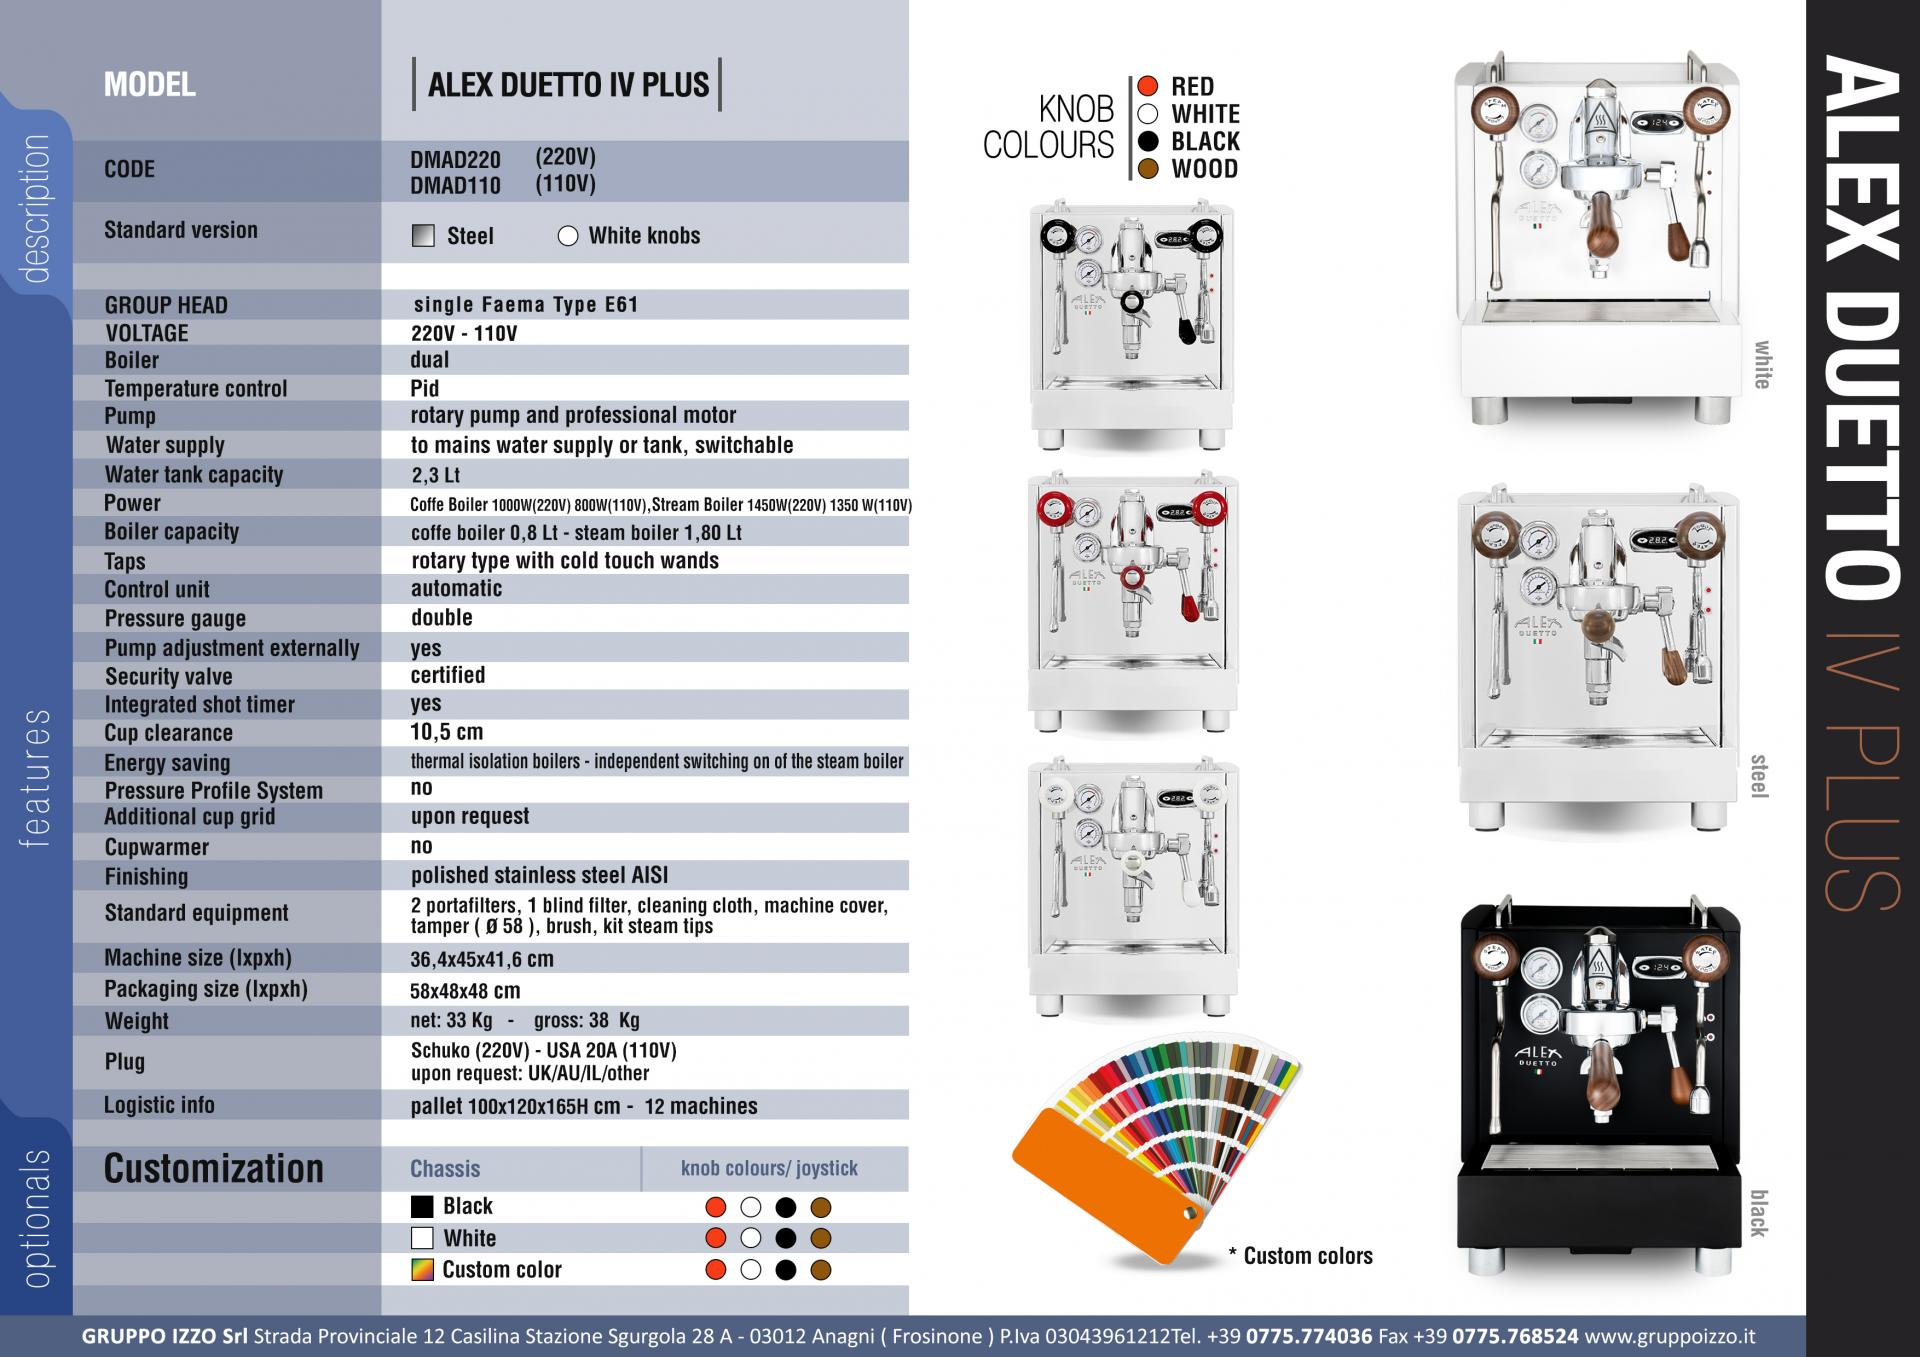 Listino alex duetto iv plus eng sito rev02